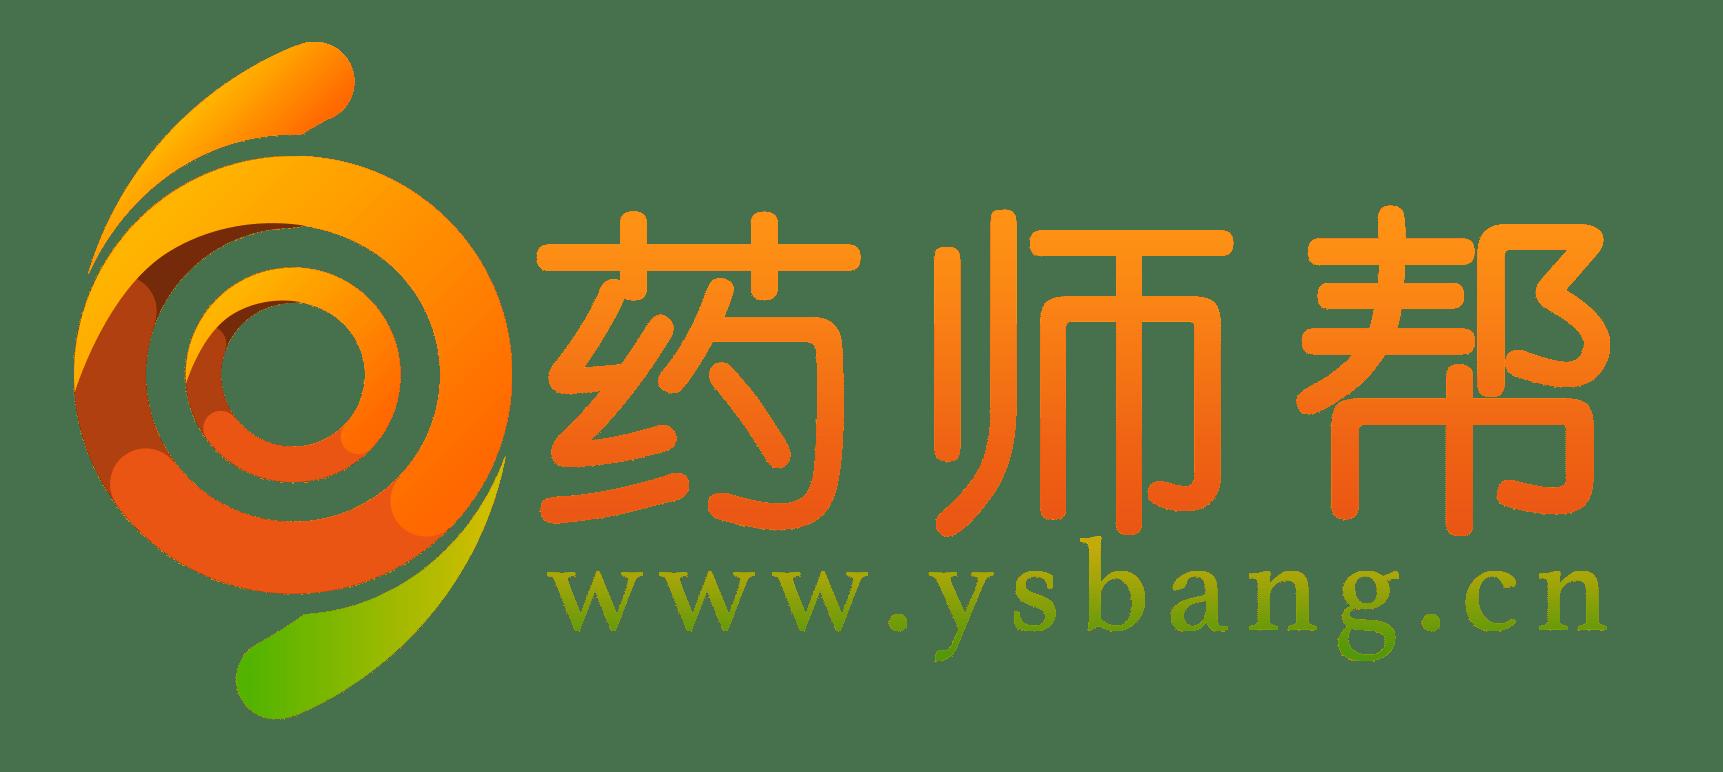 Yaoshibang company logo